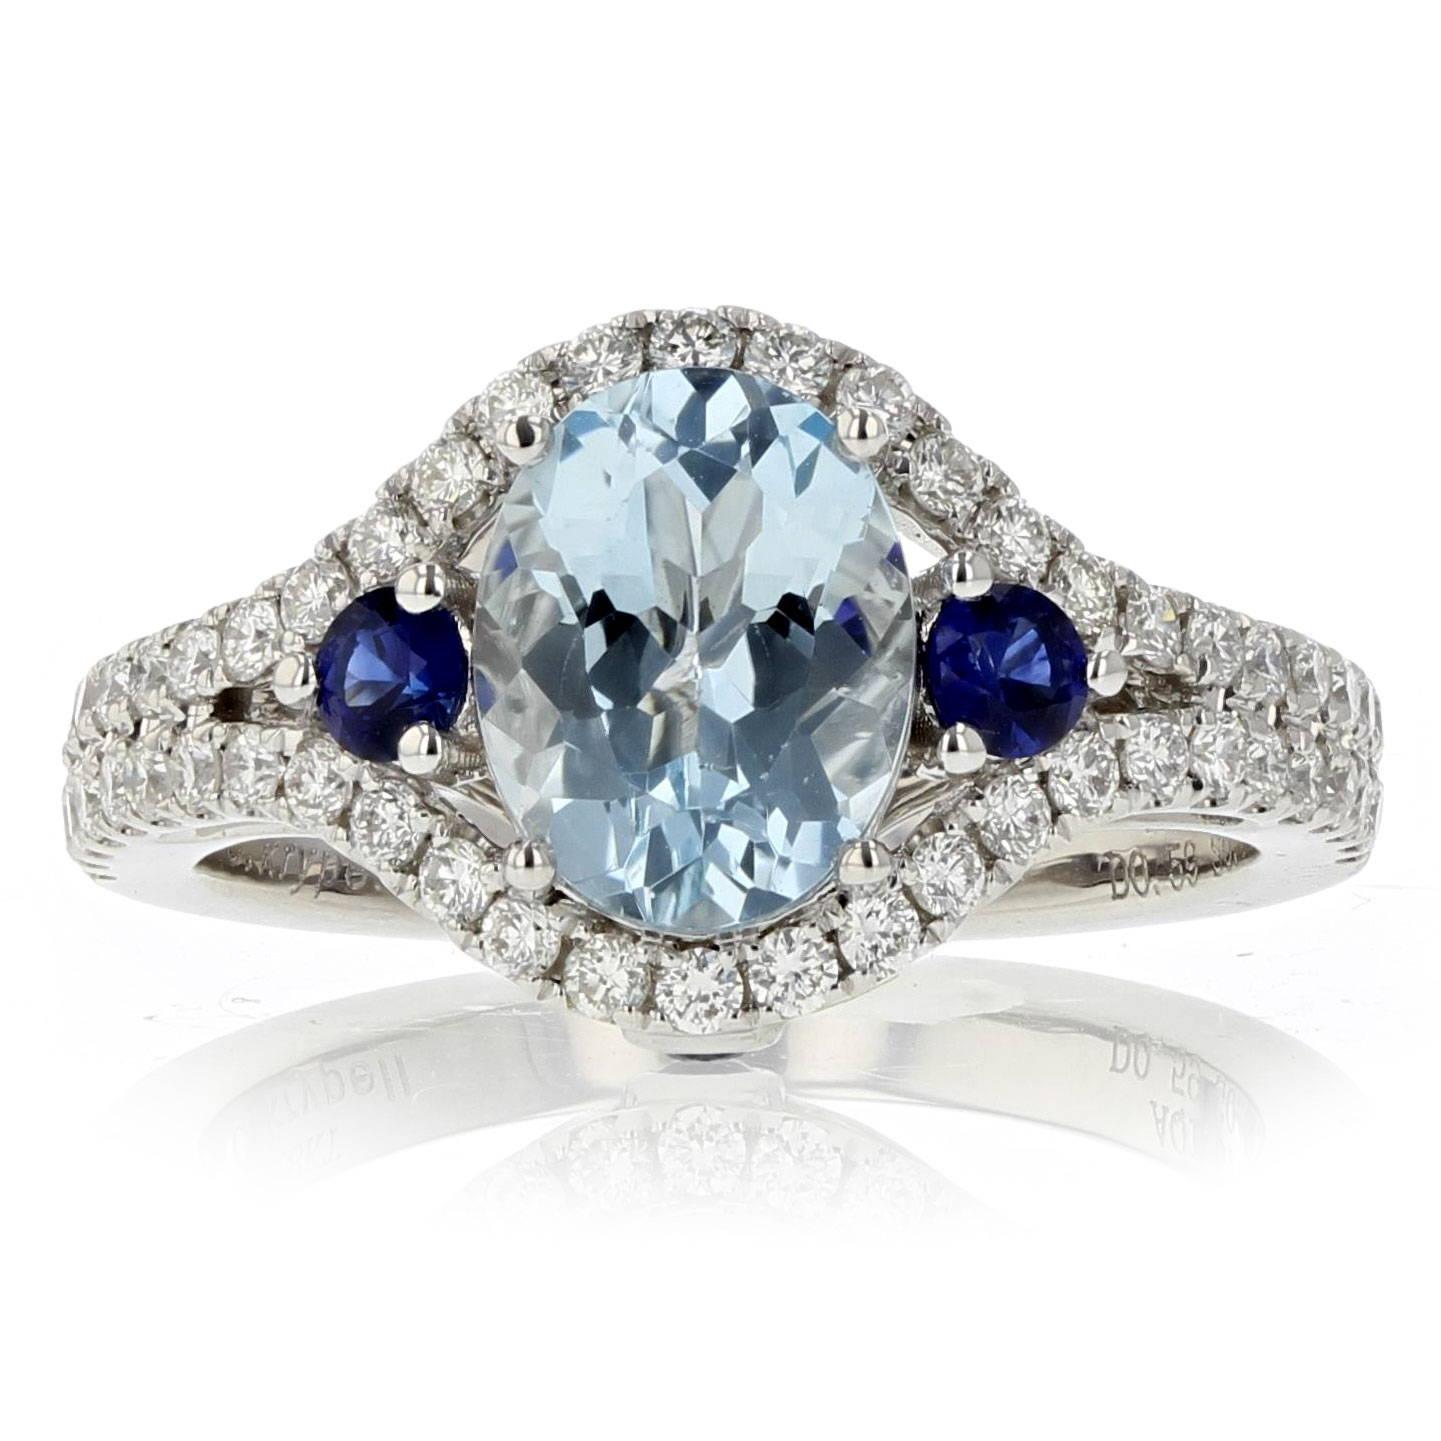 Charles Krypell Aquamarine Ring